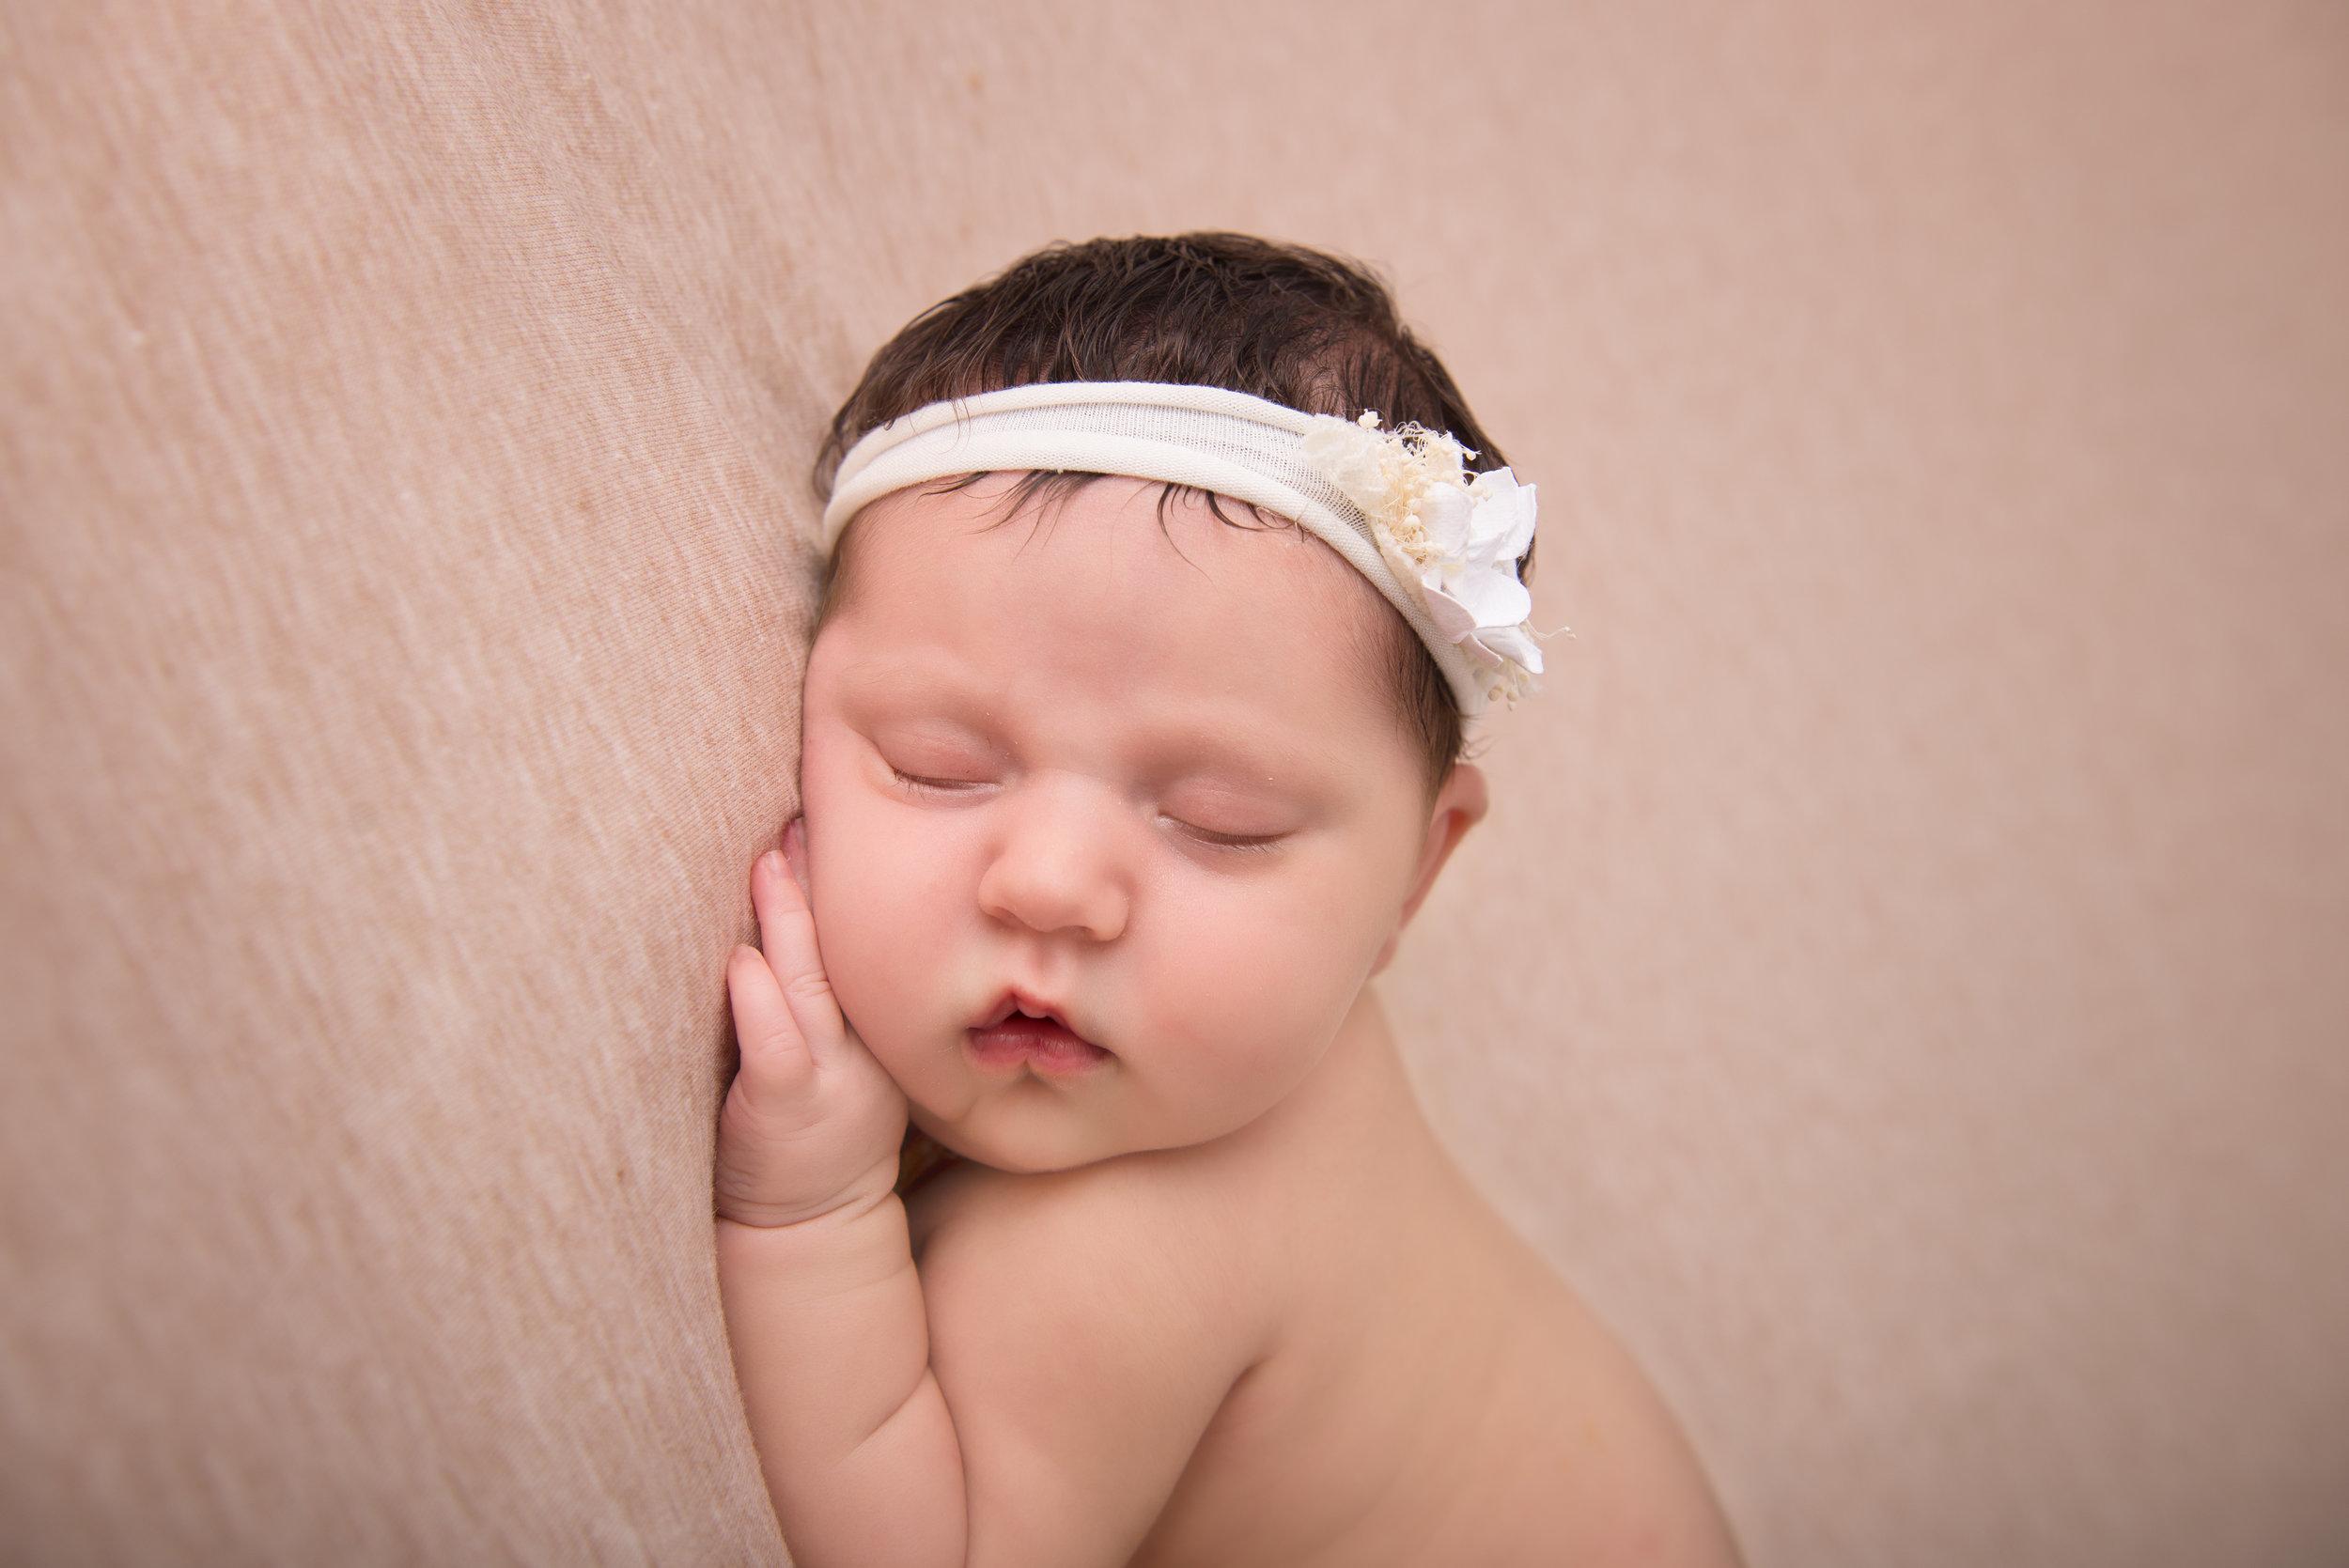 """She did amazing with my stubborn newborn!"" - Holly Richmond"